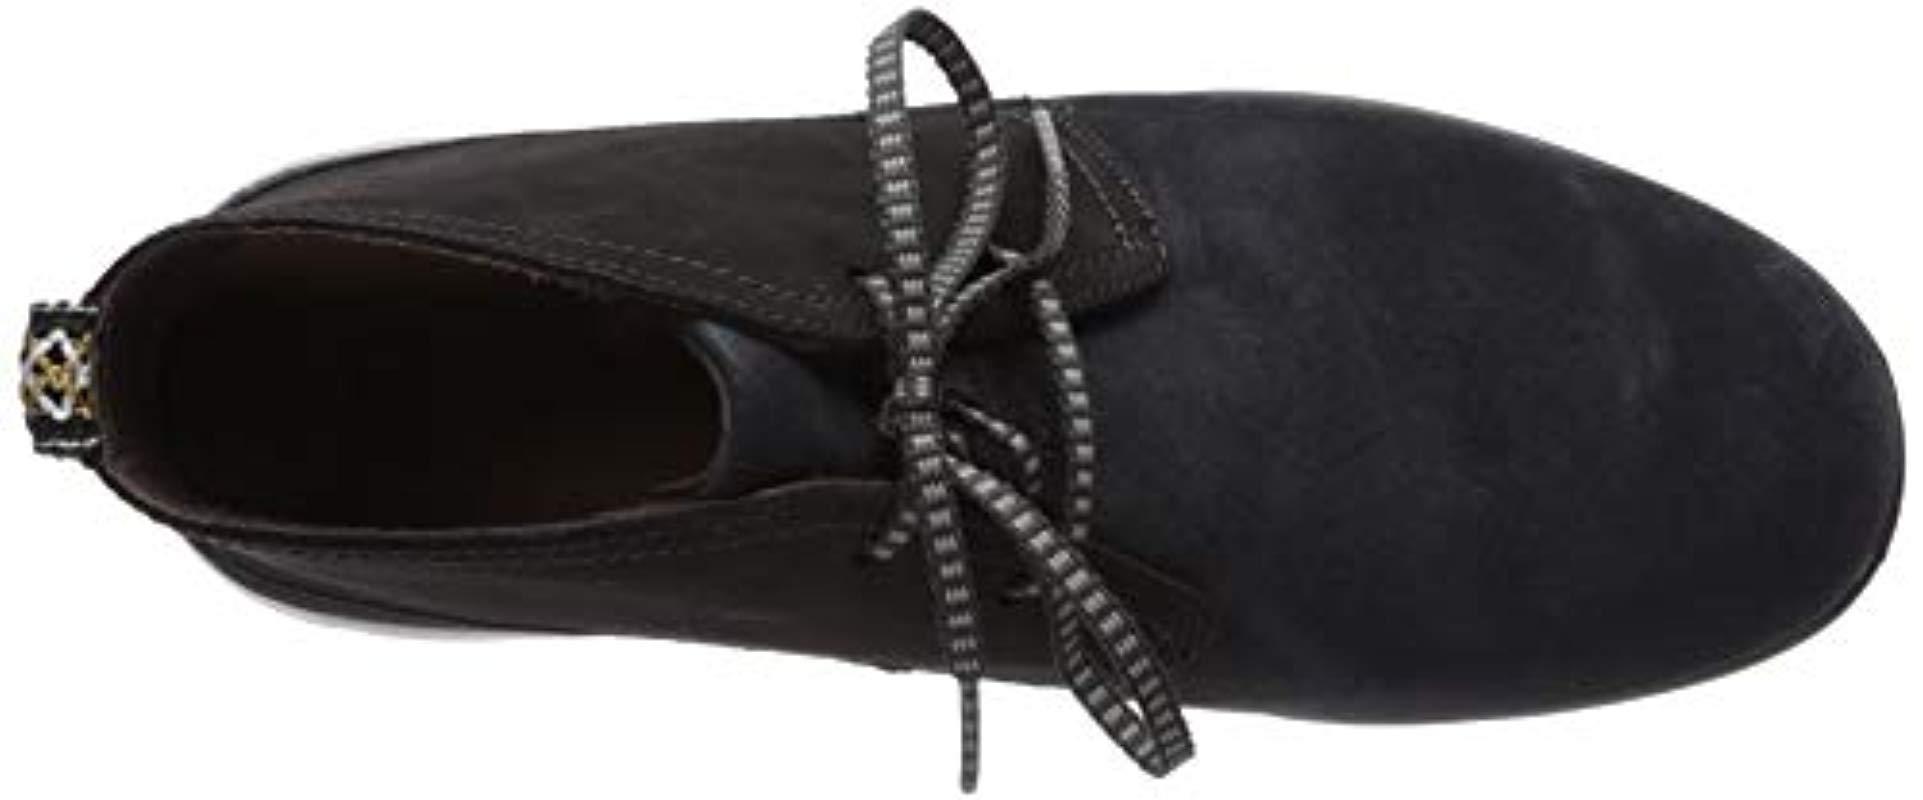 3f6108f52e6 Lyst - UGG Freamon Waterproof Chukka Boot in Gray for Men